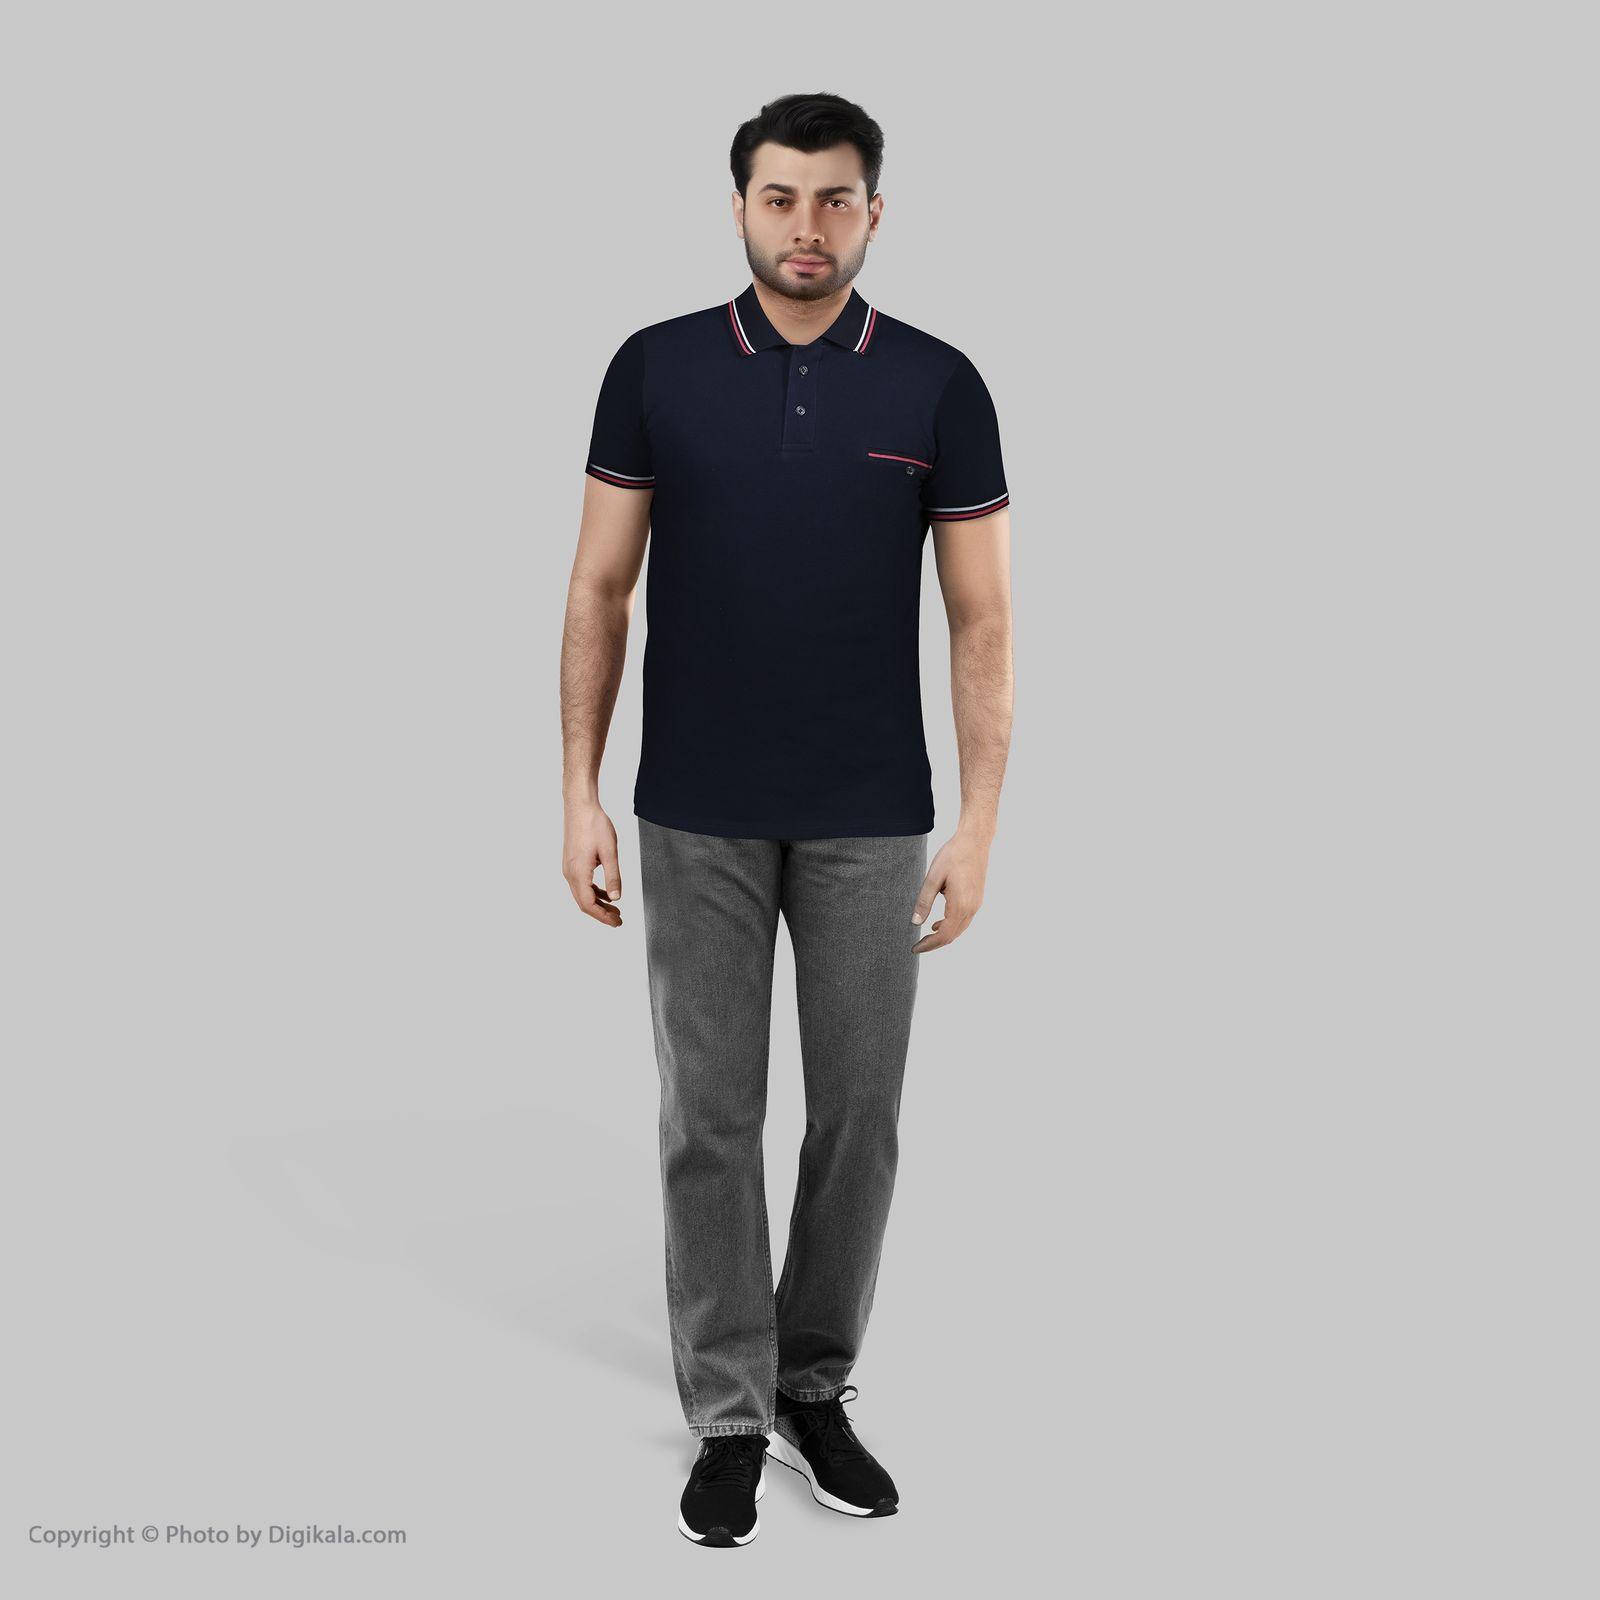 پولوشرت آستین کوتاه مردانه باینت مدل 379-1 -  - 3